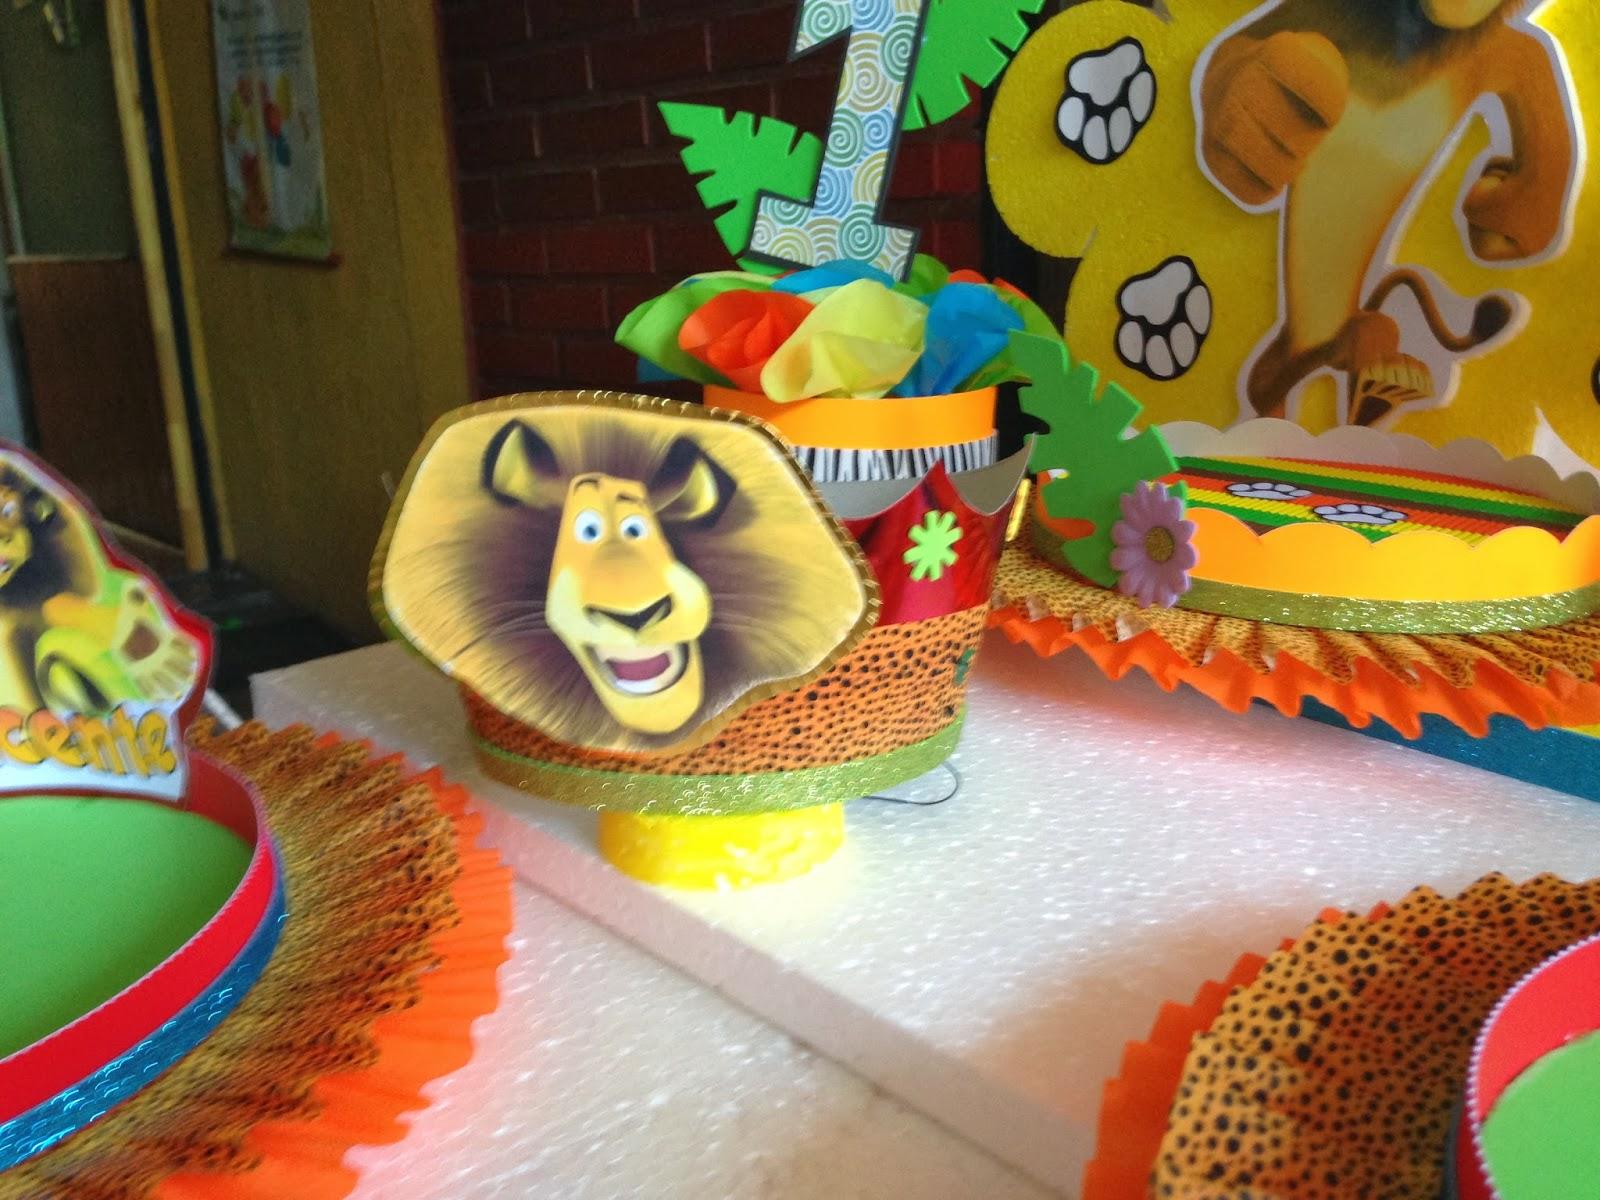 Decoraciones infantiles madagascar - Decoraciones para cumpleanos infantiles ...